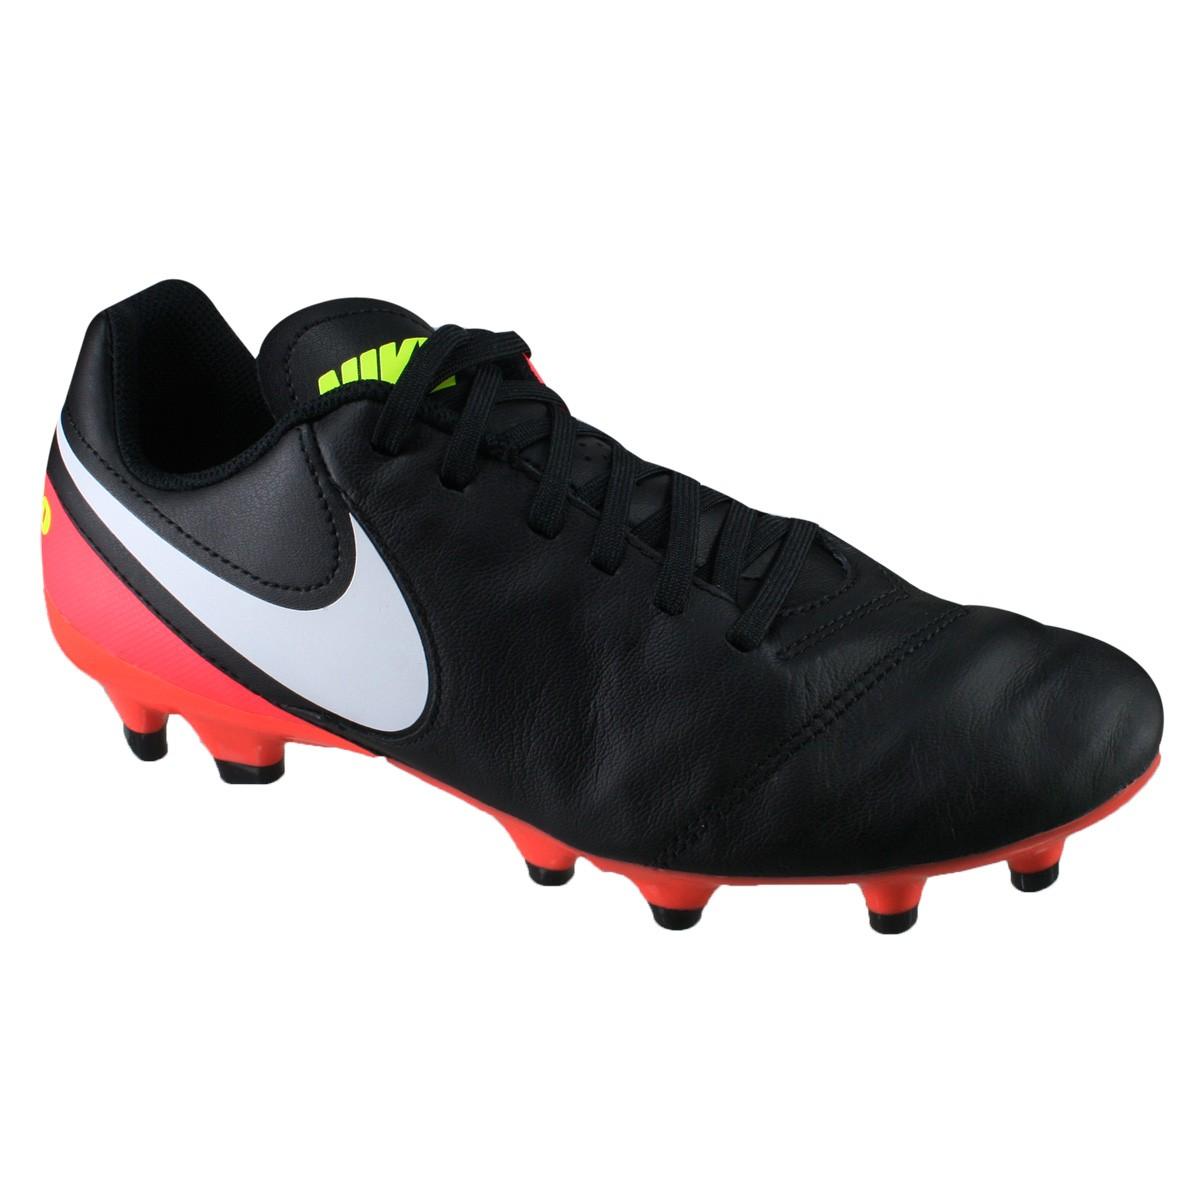 1e3354a41f Chuteira Nike Tiempo Genio II Leather FG 819213-018 - Preto Salmão ...